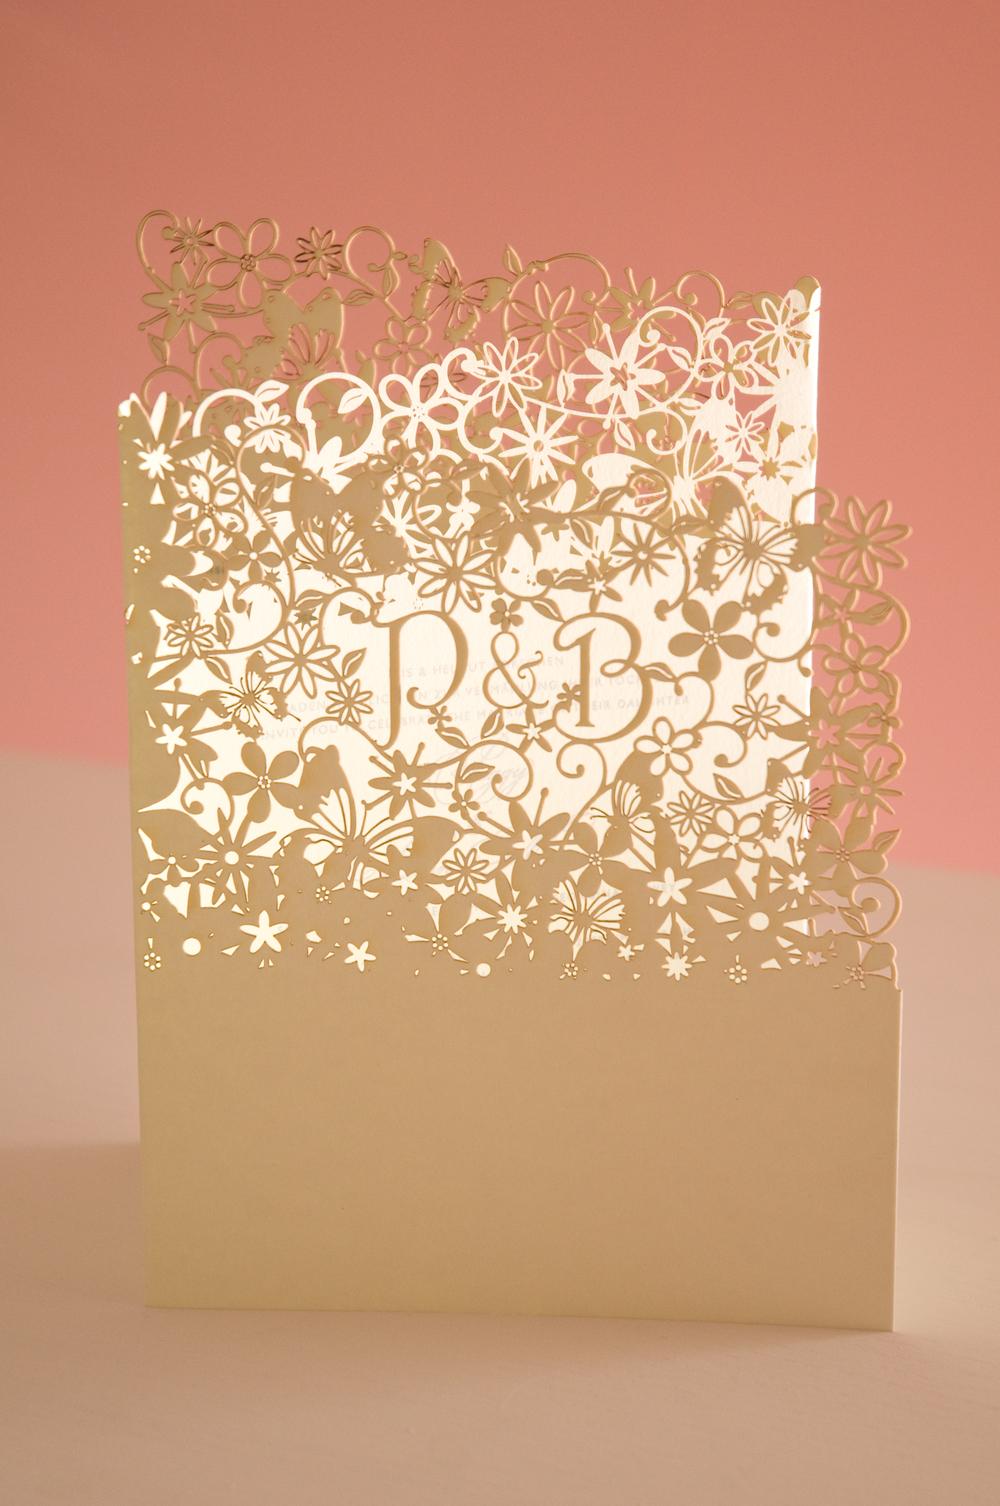 Chartula | Fairytale Bespoke Laser Cut Invitation | Natural & Pistachio #LuxuryWedding #LaserCutInvitations #FairytaleWedding | www.chartula.co.uk